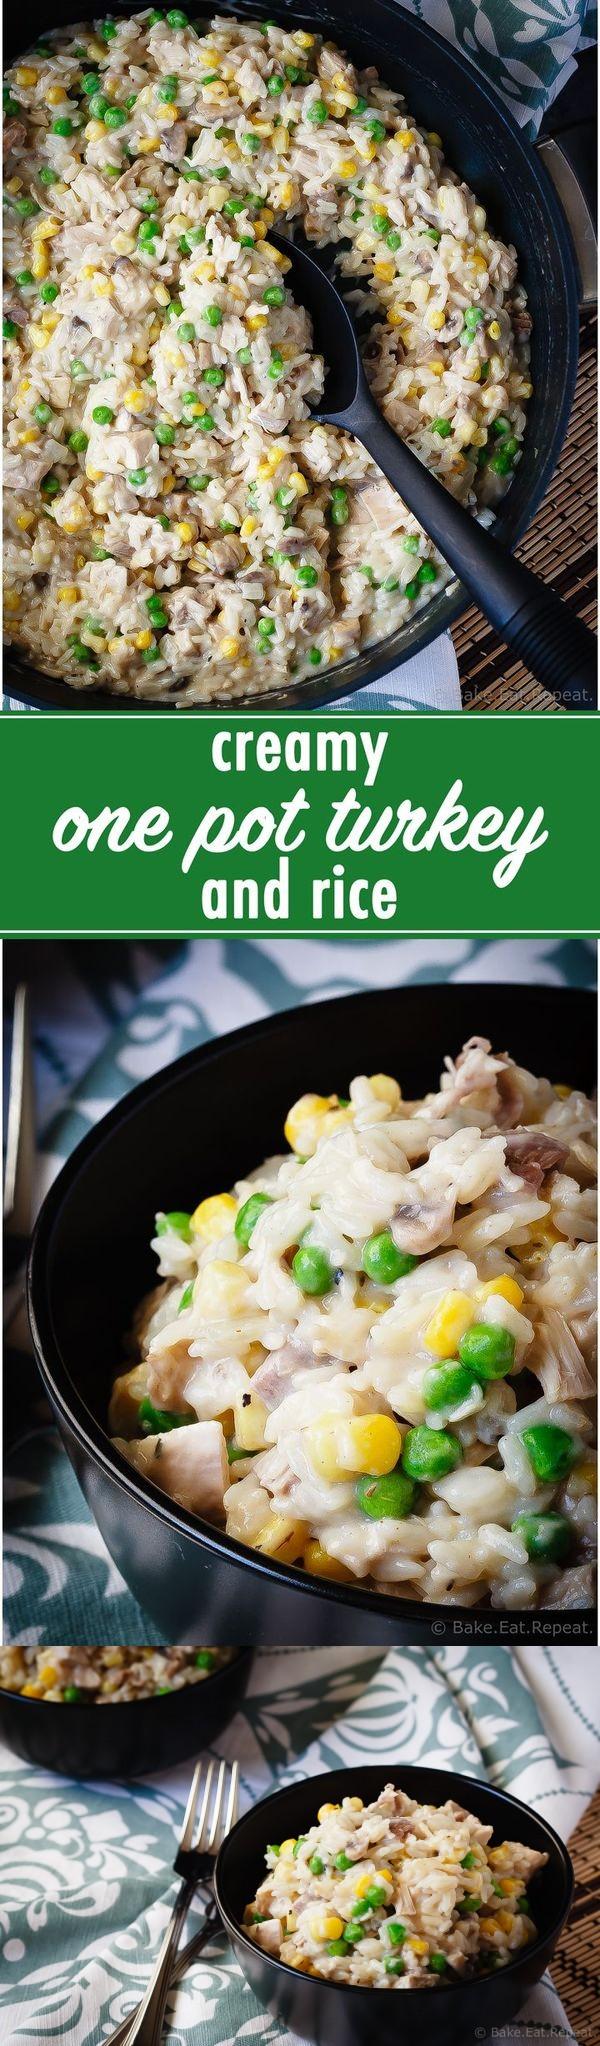 Creamy One Pot Turkey and Rice